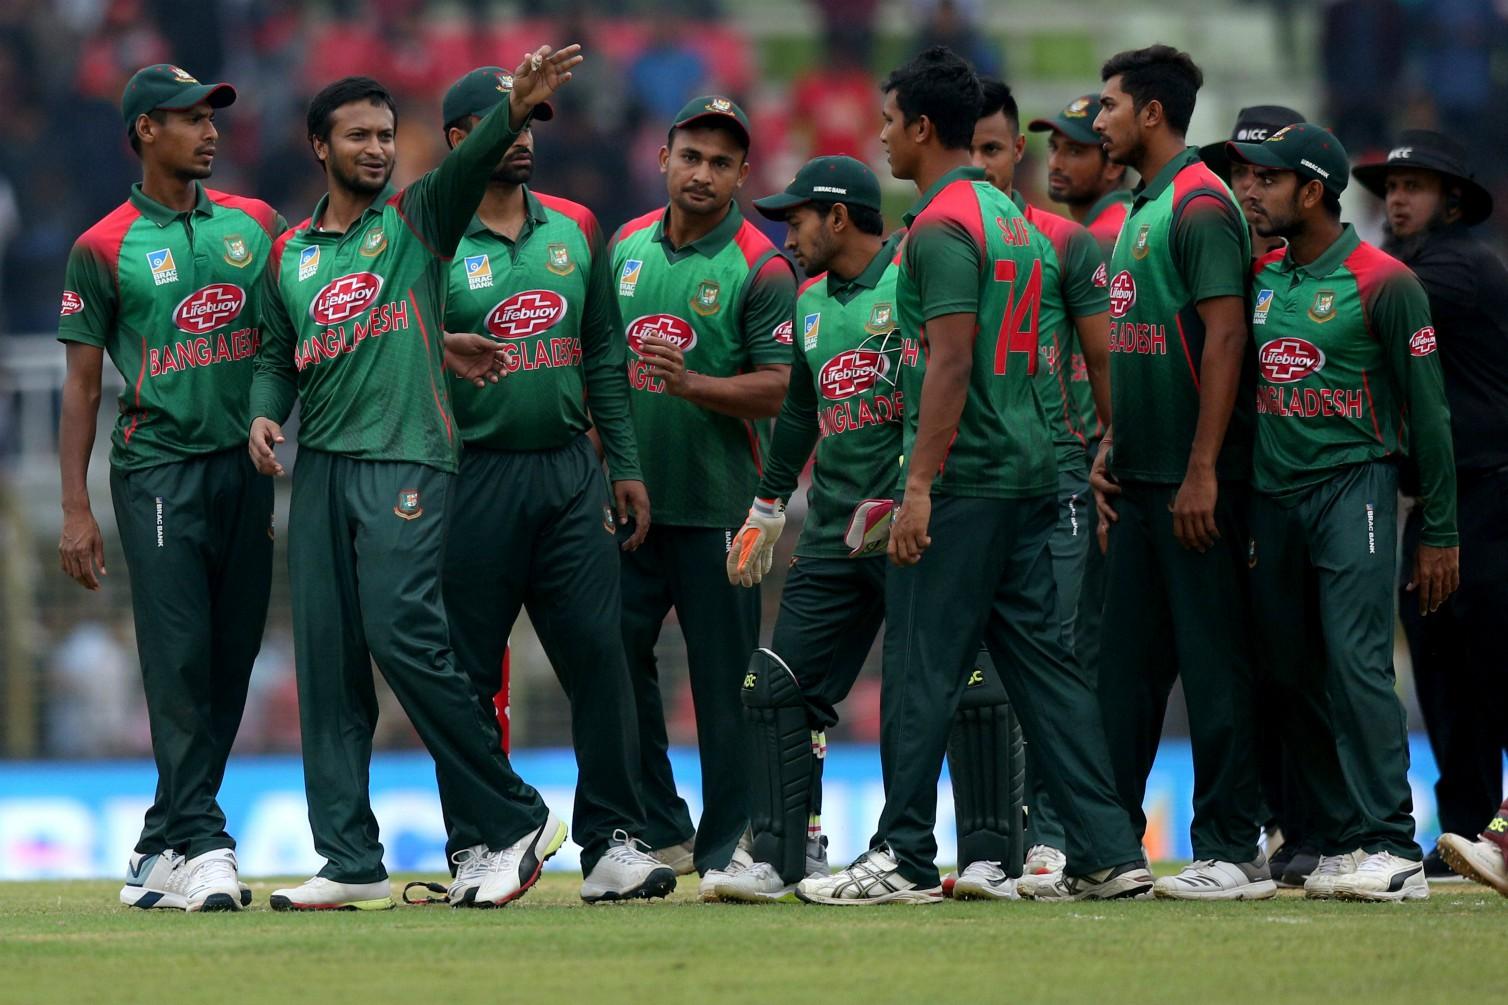 ICC T20 World Cup 2021: India Squad And Schedule, All Team Squad, Venue - বিশ্বকাপের জন্য ঘোষণা হলো সকল টিমের খেলোয়াড় তালিকা, দেখে নিন এক নজরে 11